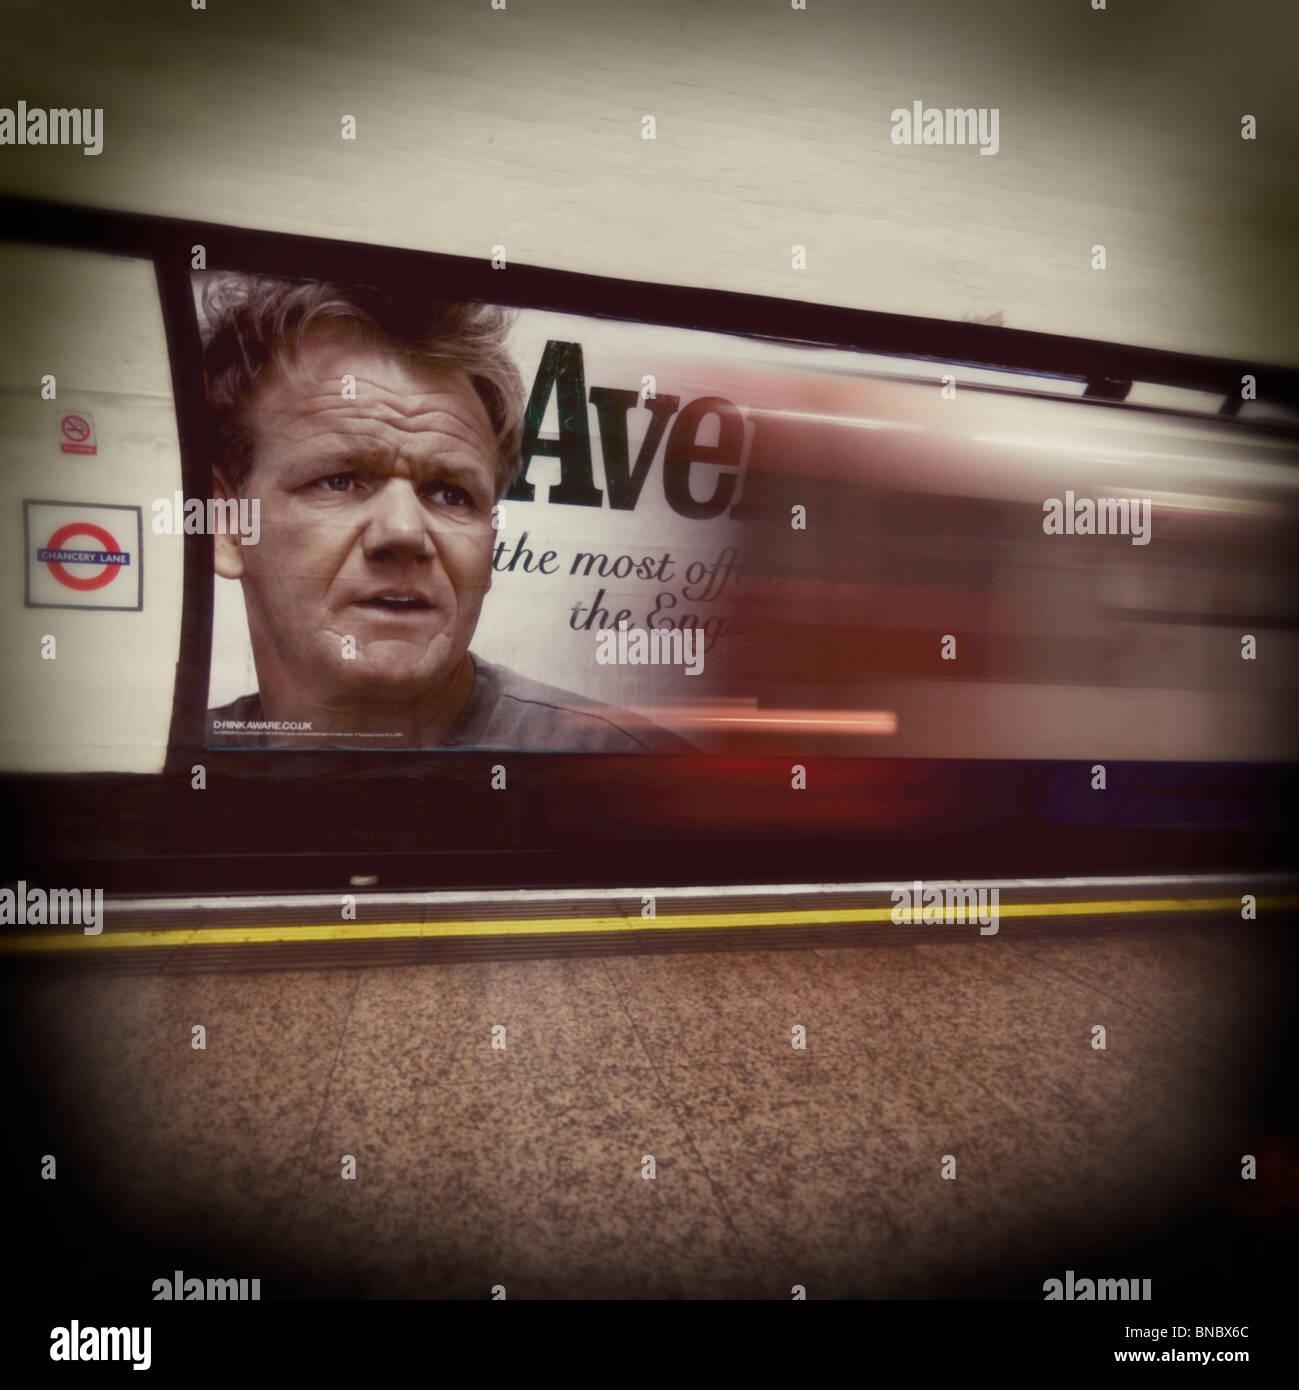 London Underground Train passing through station, London, Britain. - Stock Image